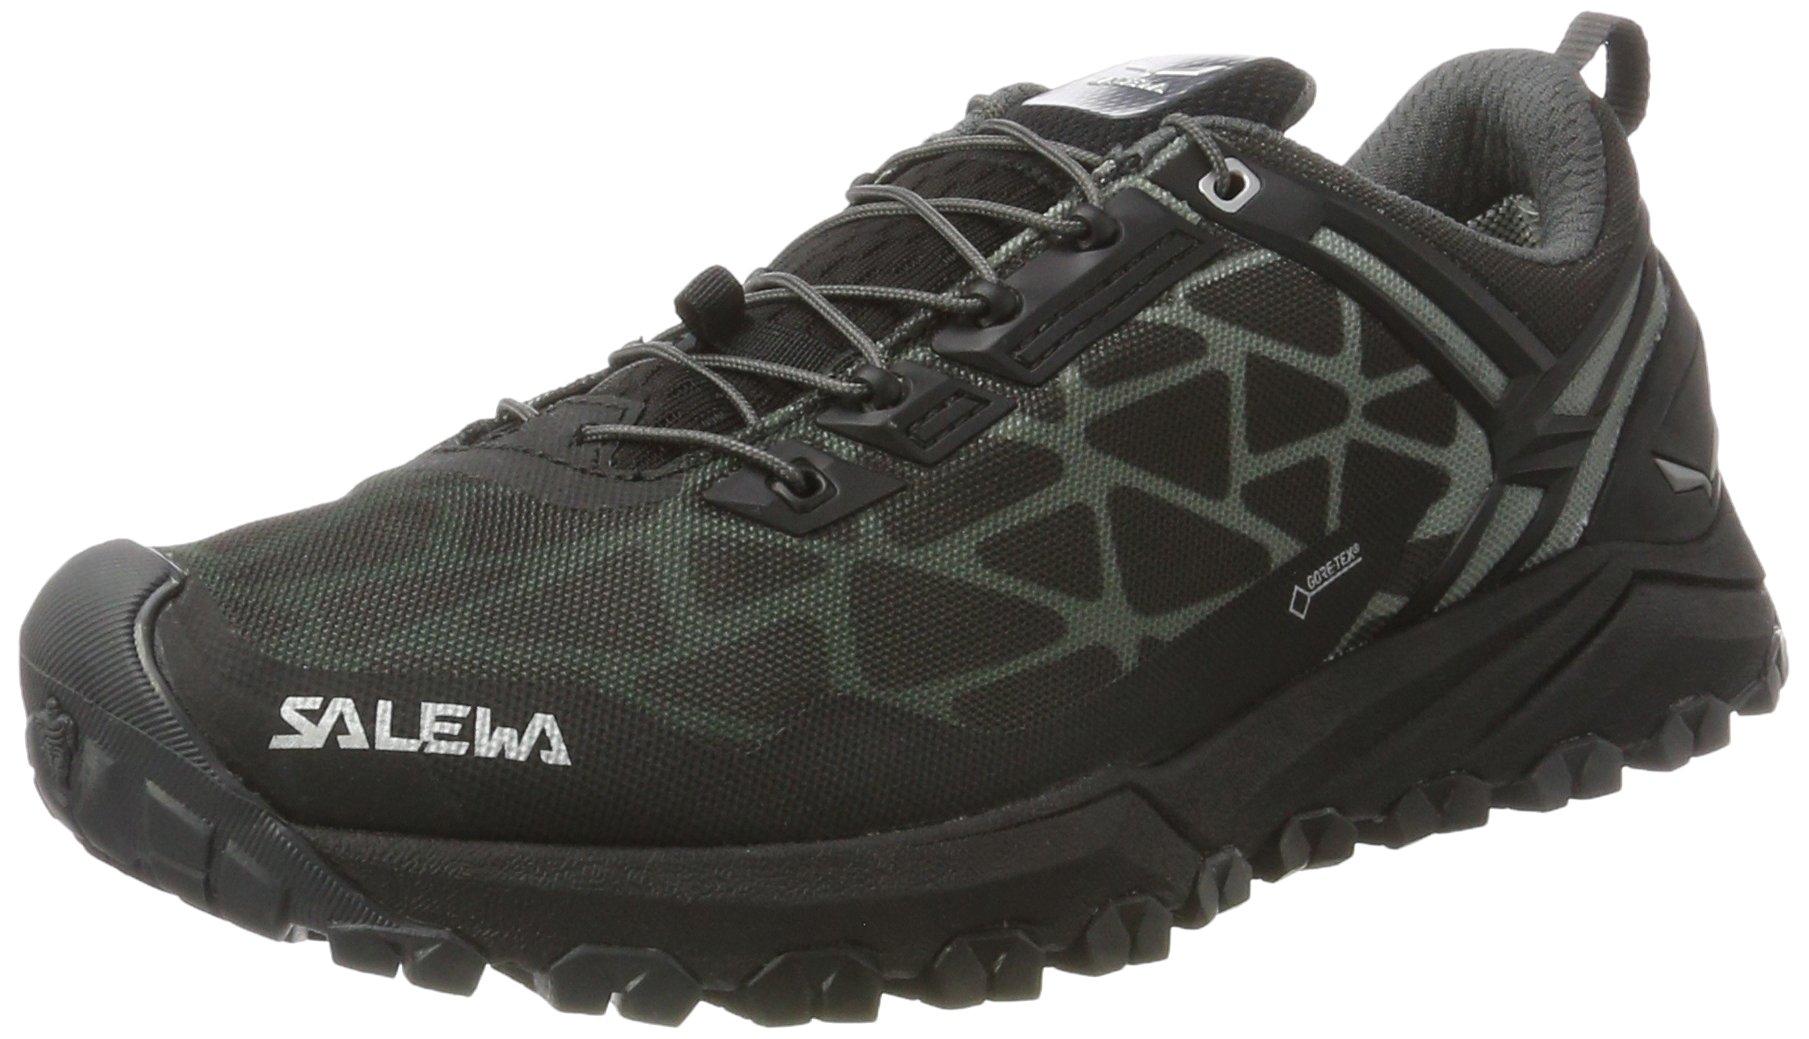 Salewa Men's Multi Track GTX Speed Hiking Shoe, Black/Silver, 12